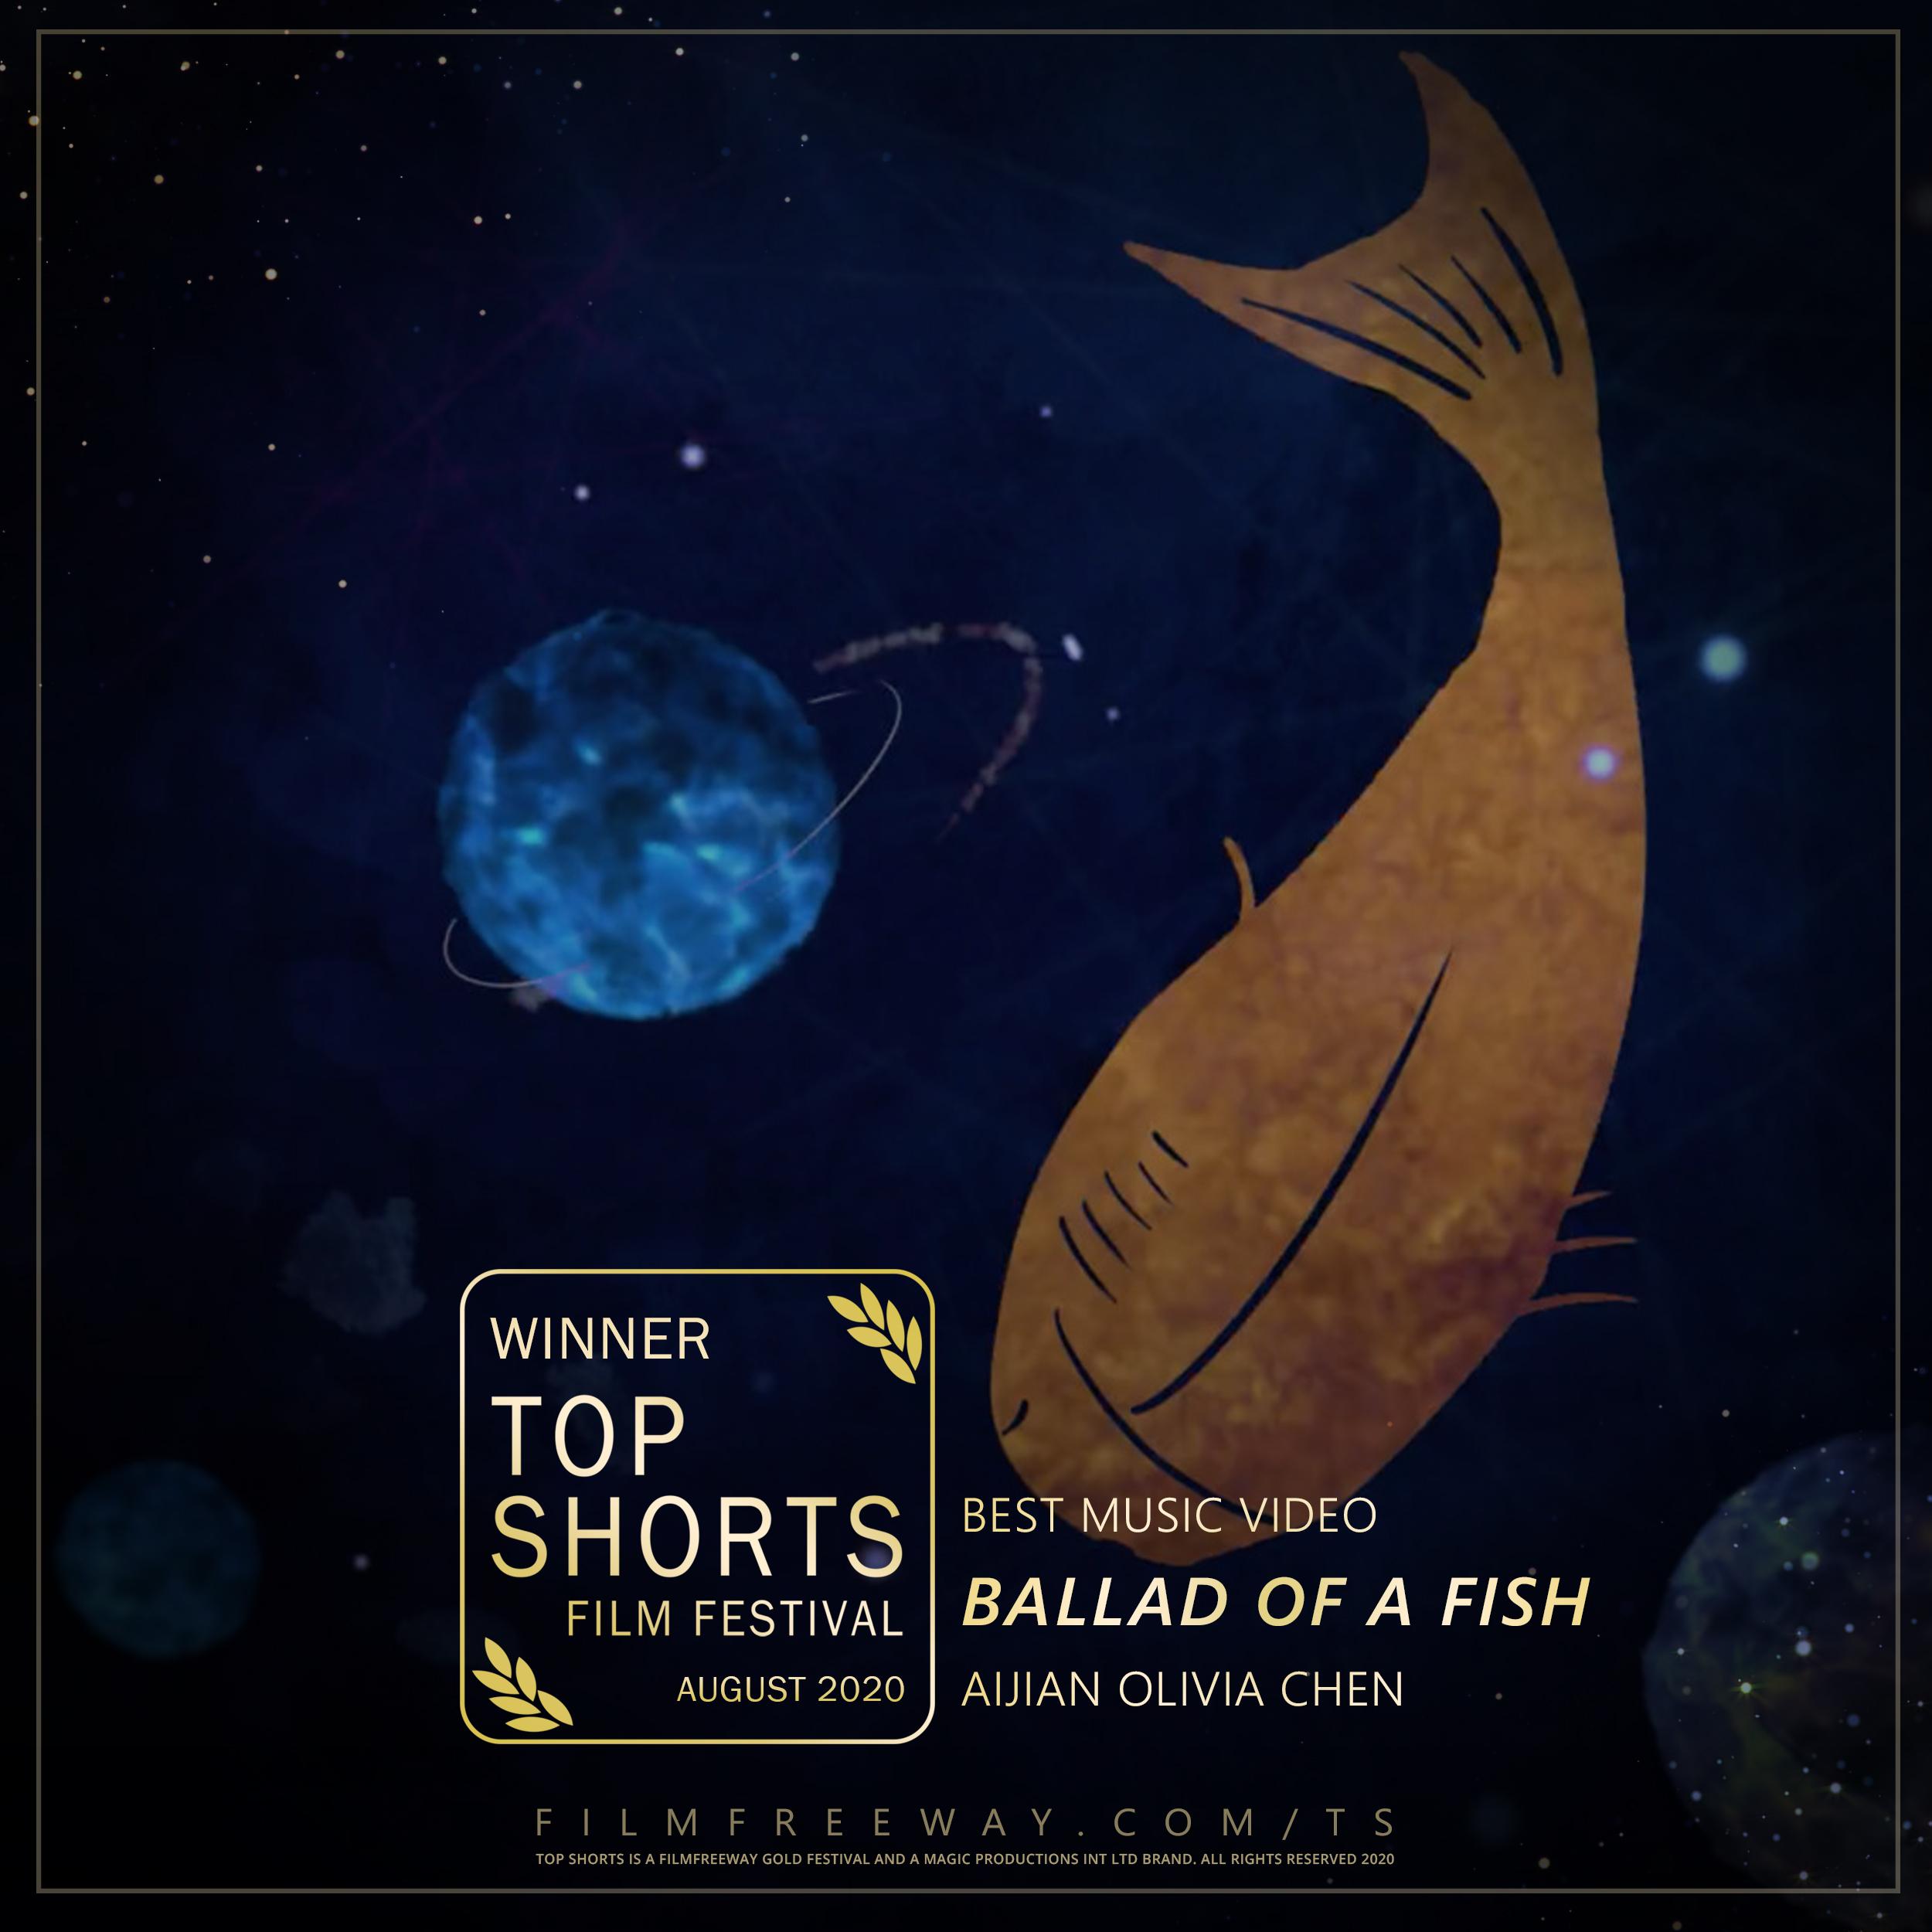 Ballad of a Fish design